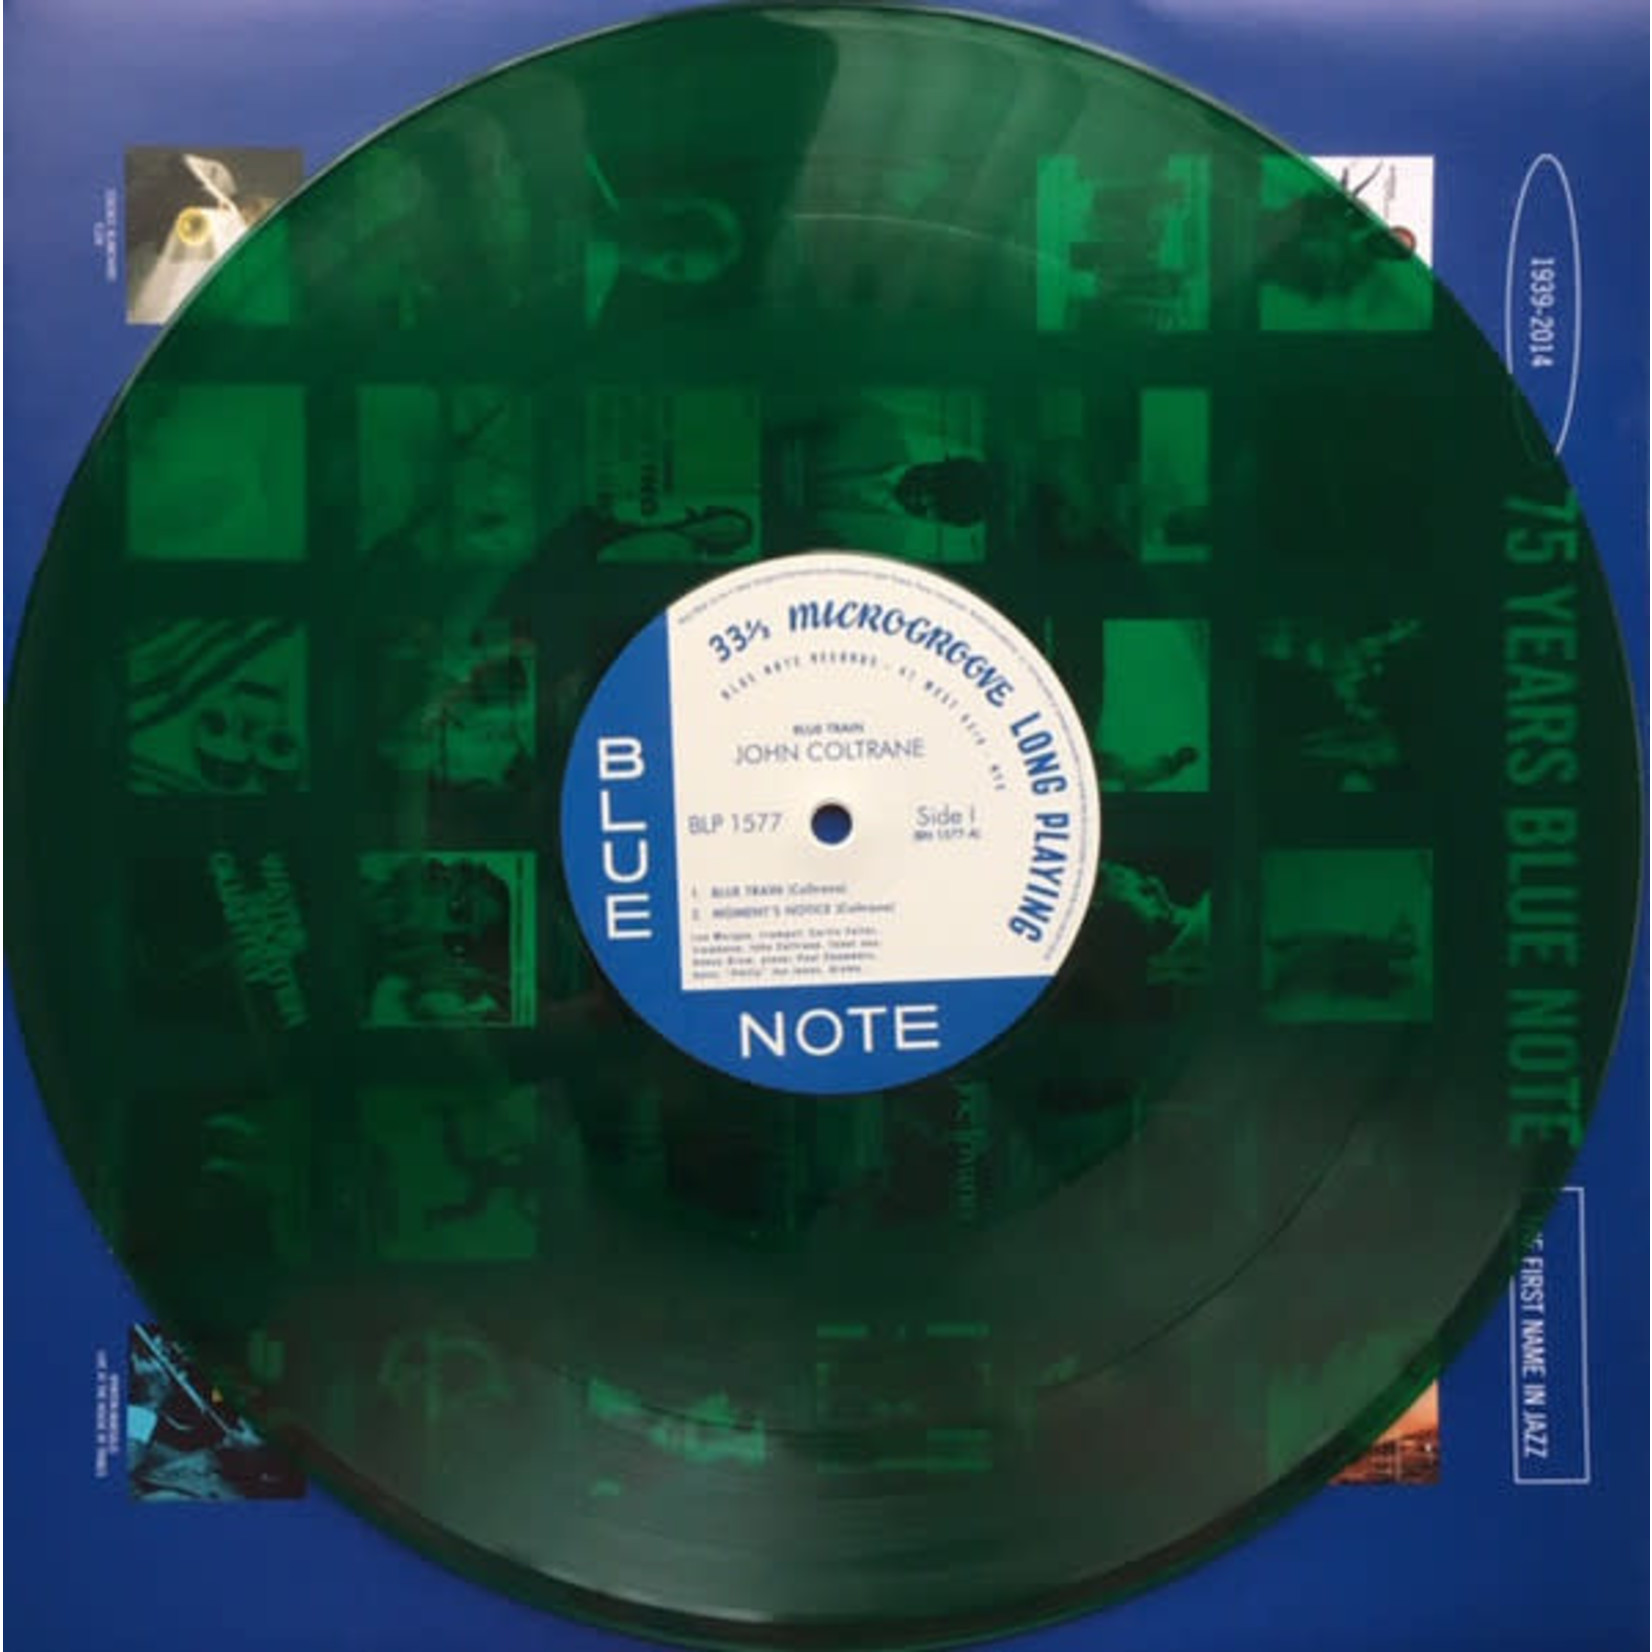 JOHN COLTRANE BLUE TRAIN (LIMITED EDITION TRANSLUCENT GREEN VINYL)